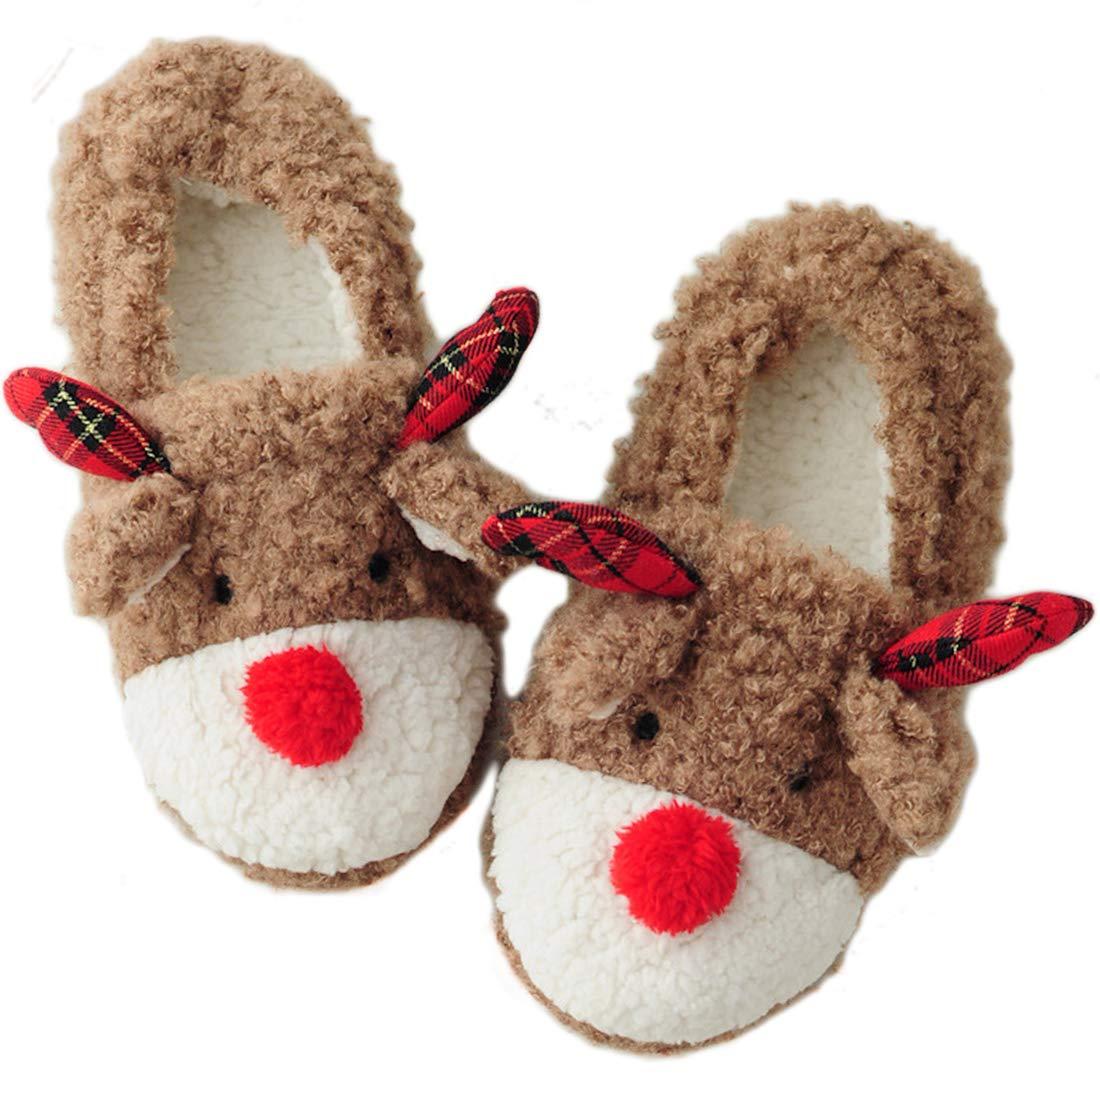 Snowdeer Women's Cute Fuzzy Reindeer House Slippers Stuffed Animal Bedroom Slippers Cozy Reindeer Indoor Shoes (Khaki 40)